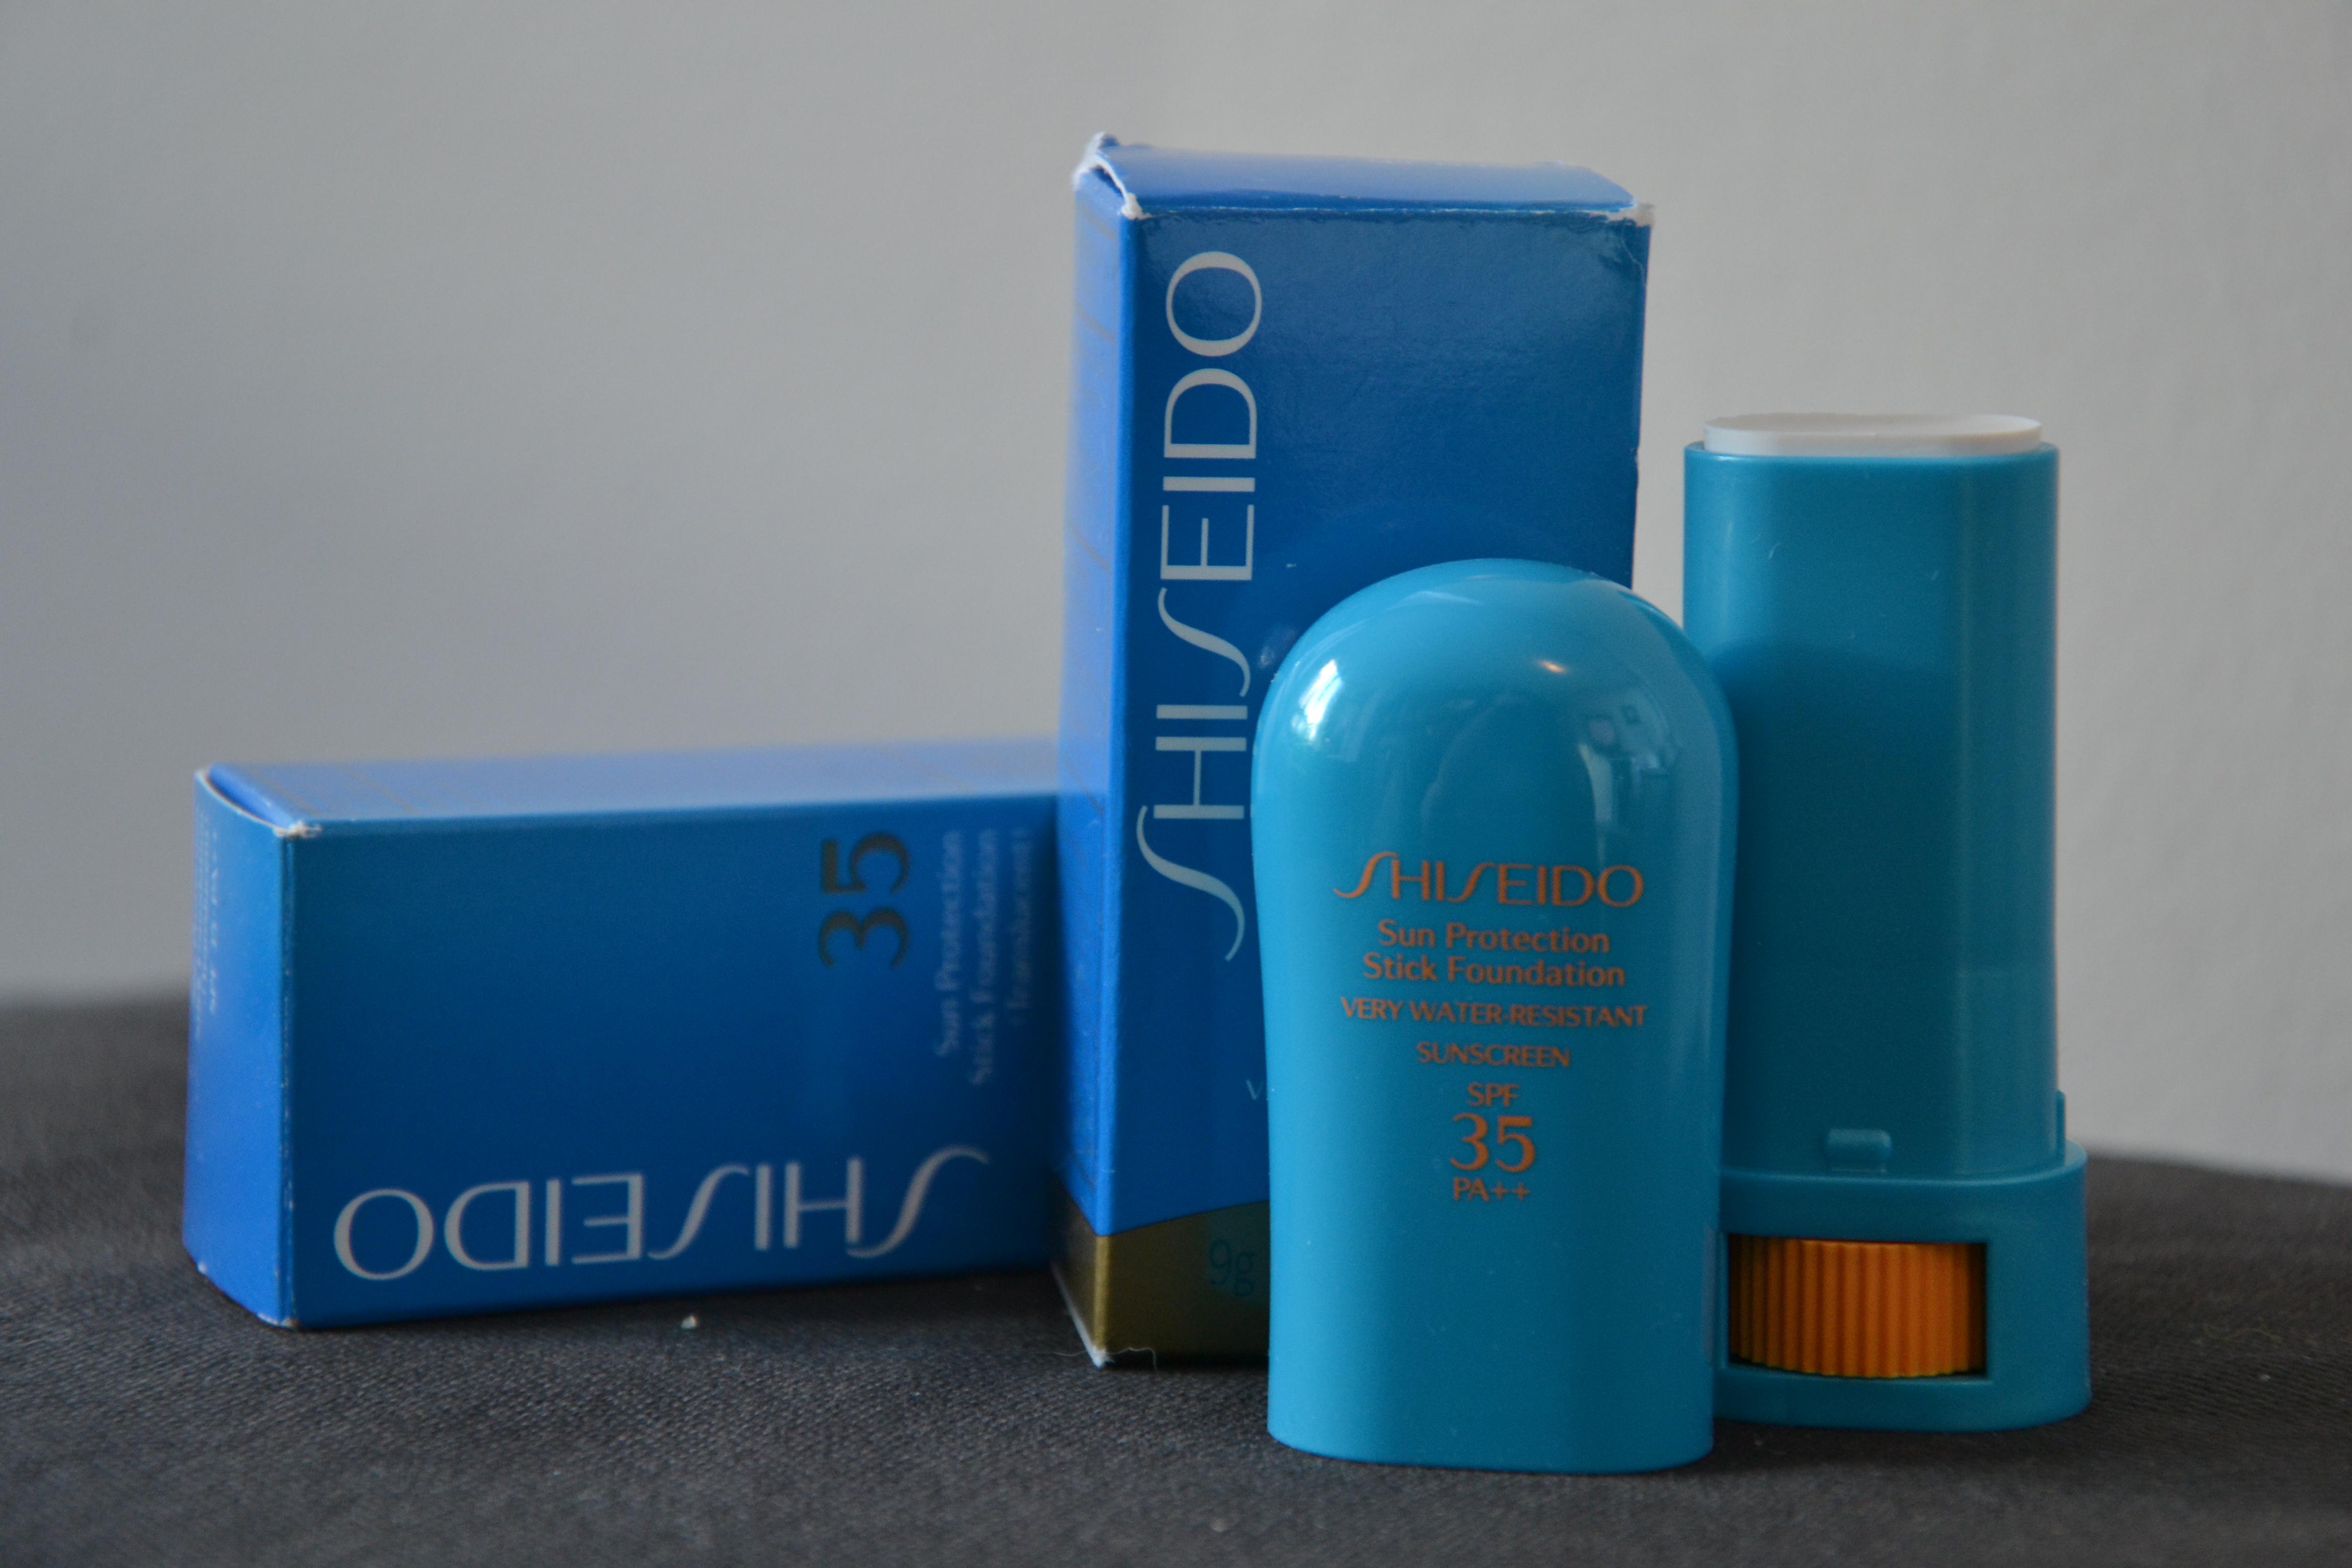 shiseido sun protection stick